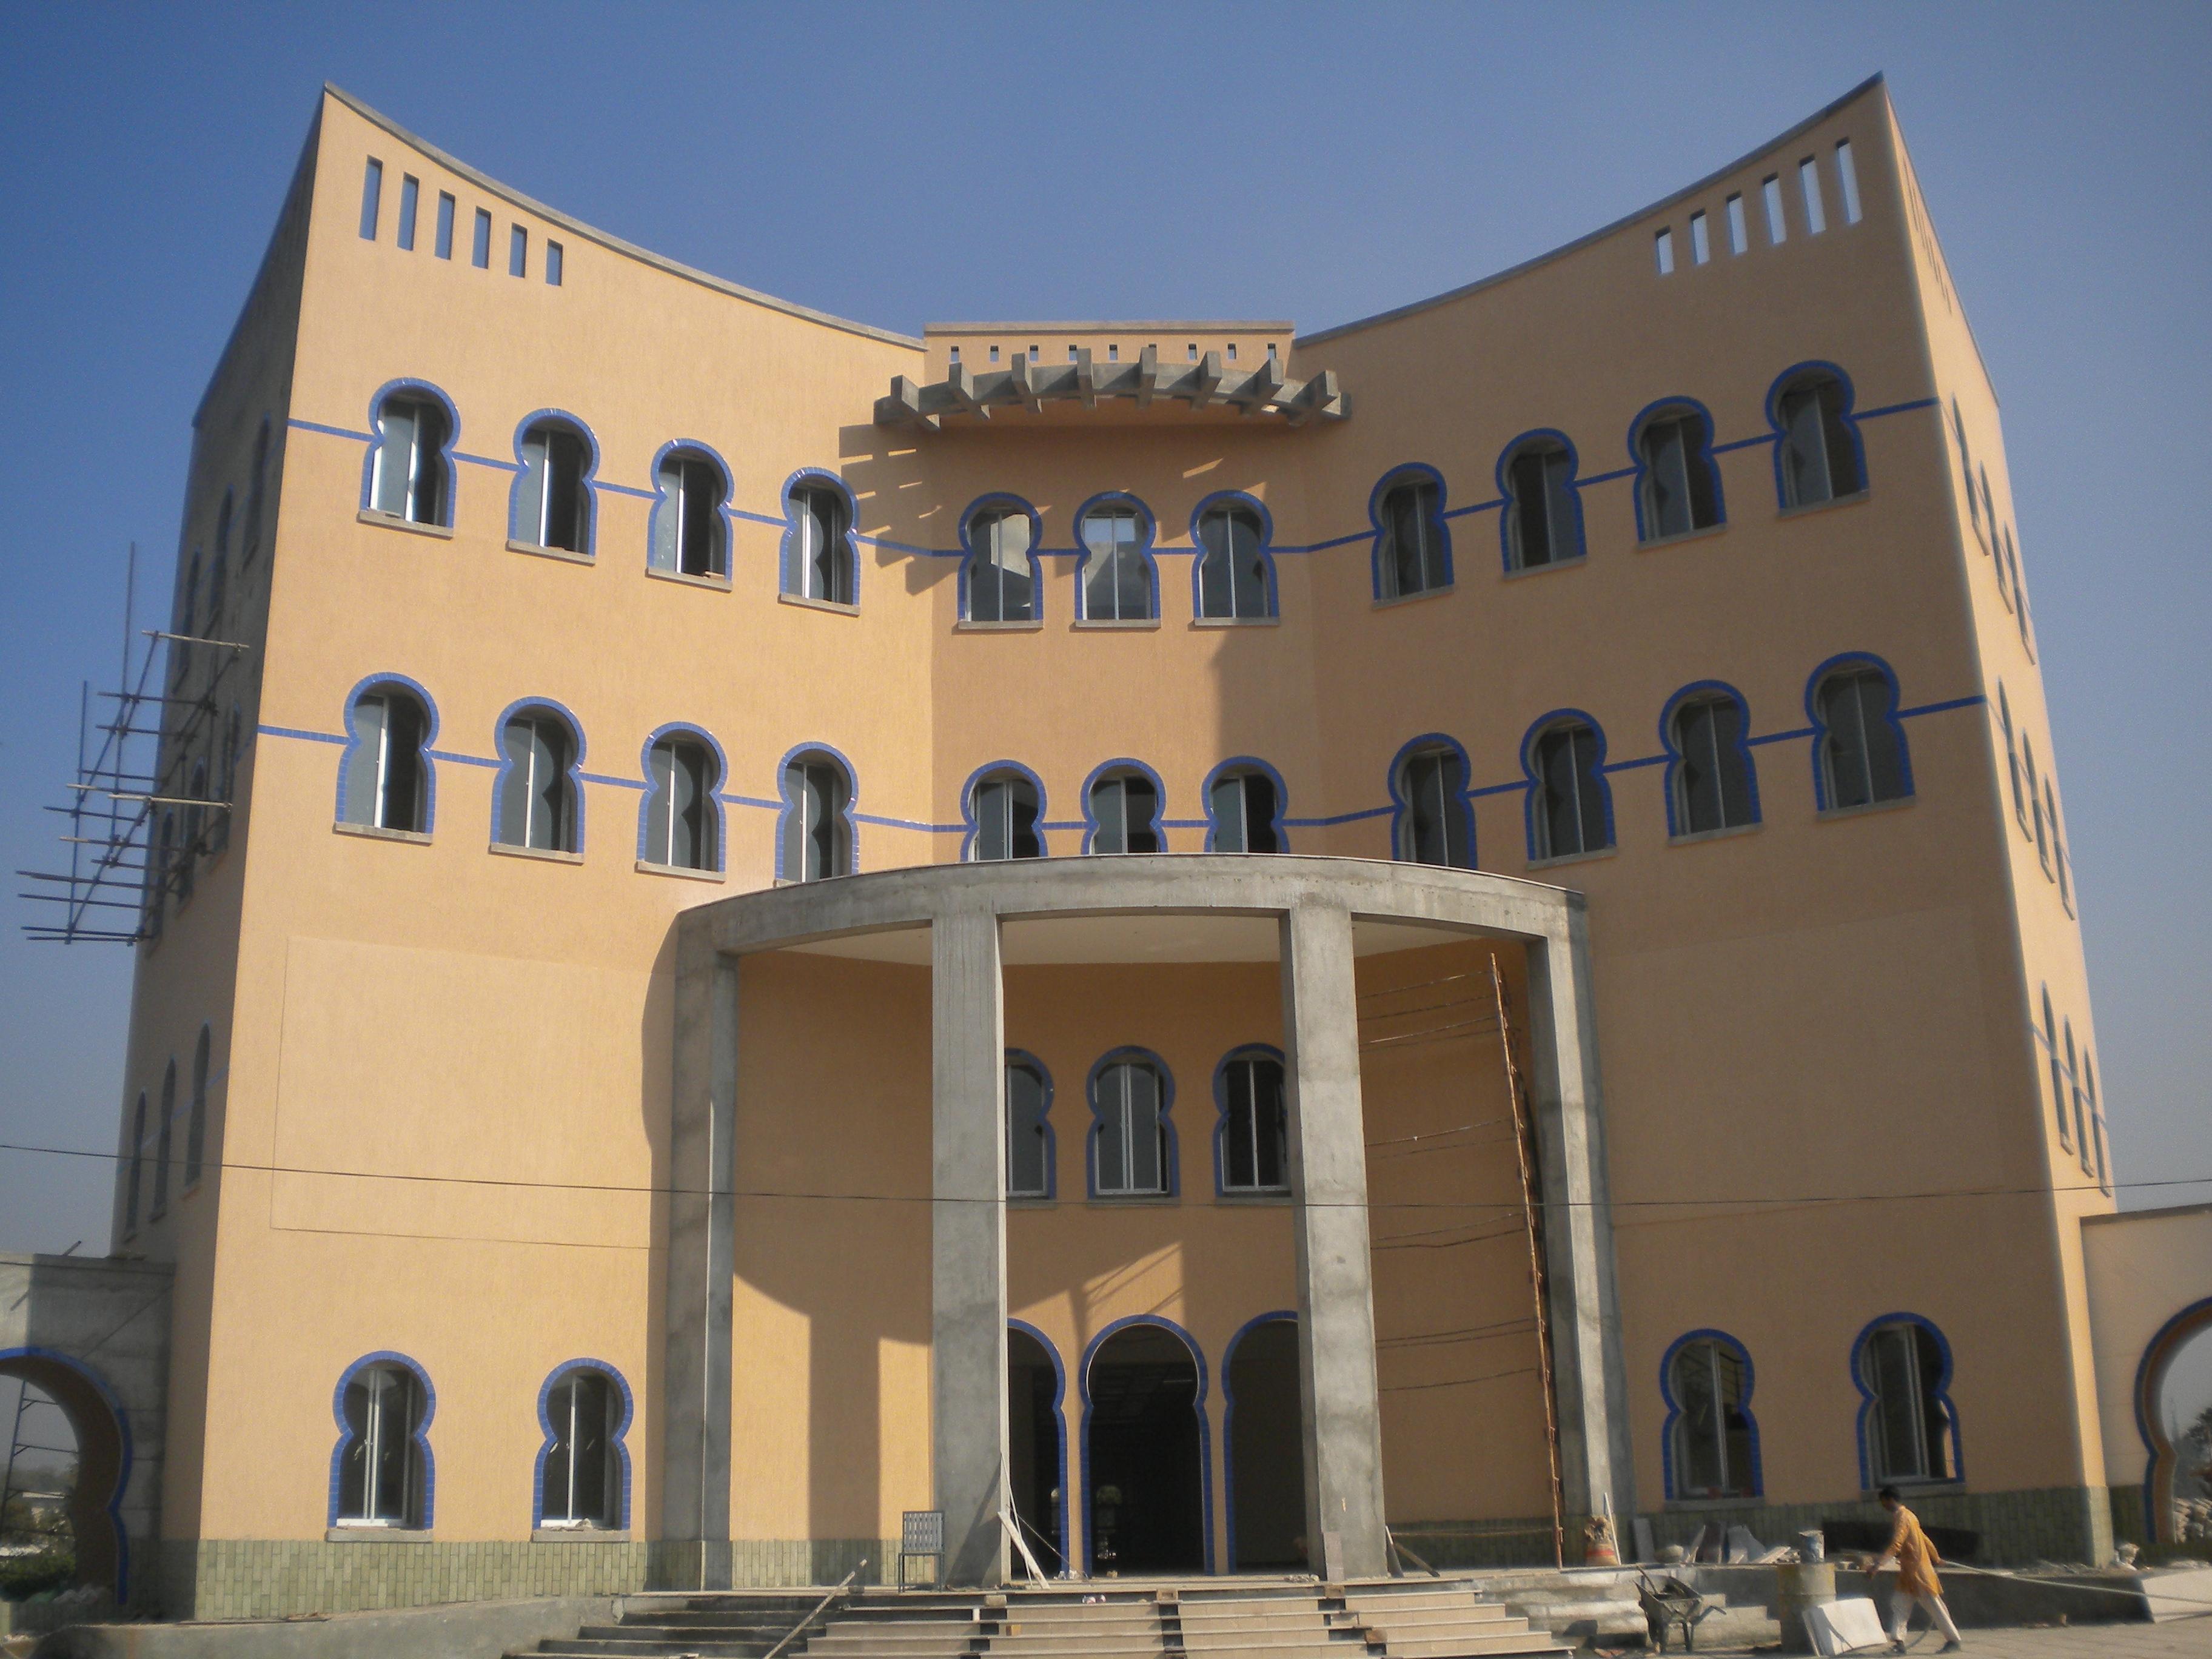 File:Allama Iqbal Open University, Islamabad.JPG - Wikimedia Commons